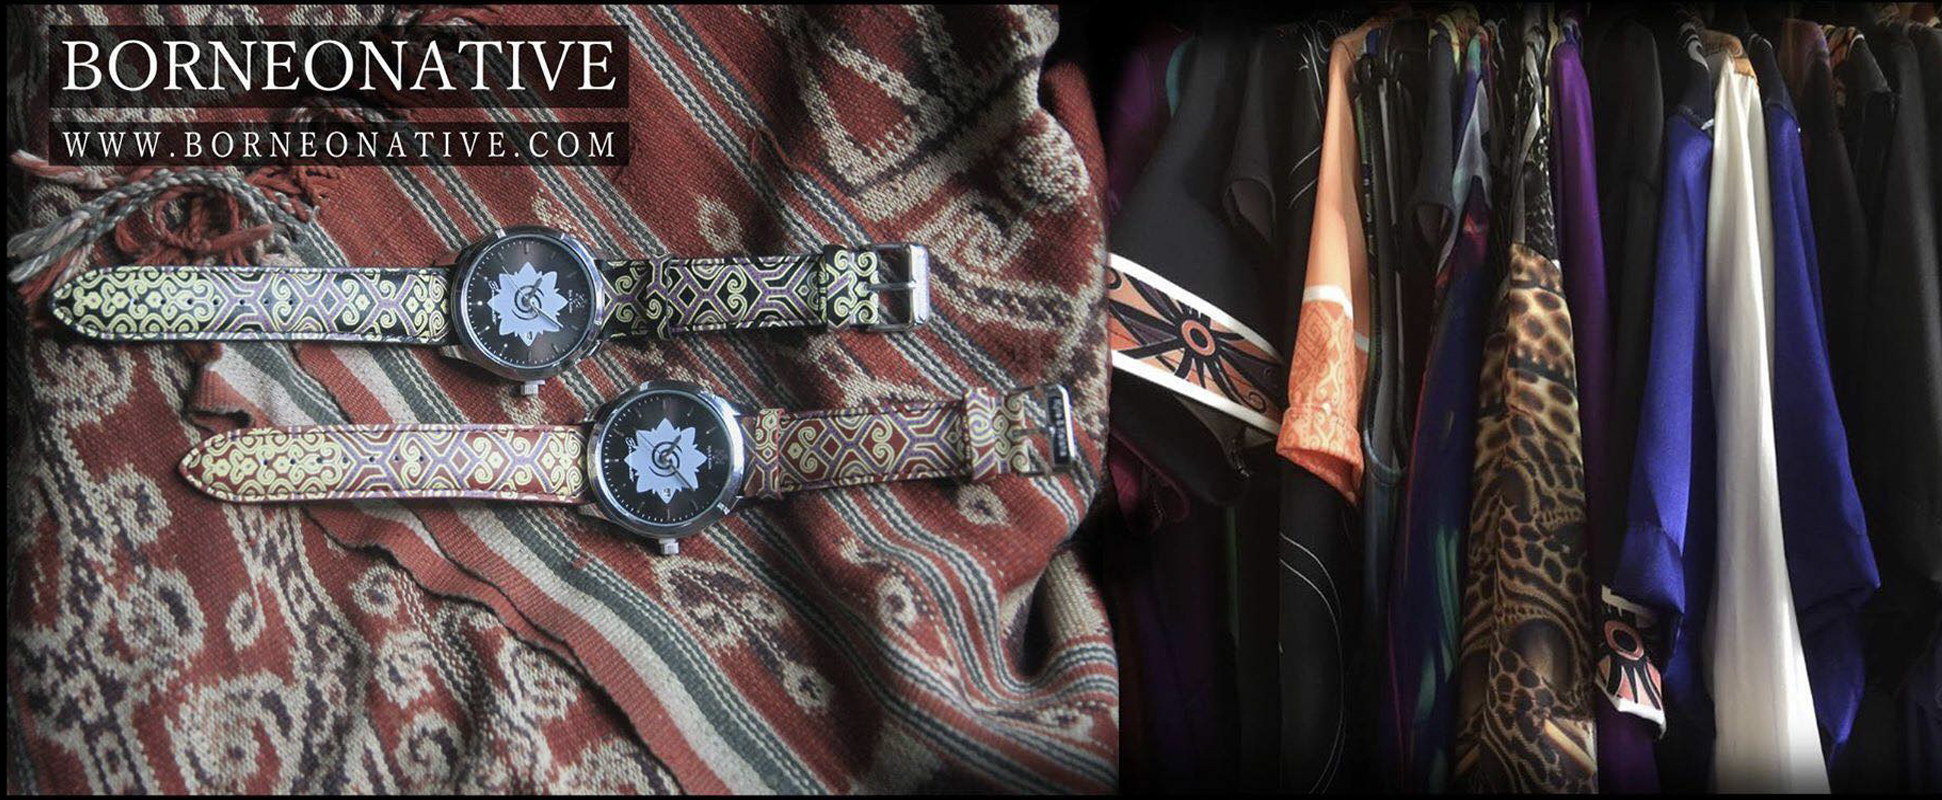 BORNEONATIVE™ - Bring the pride of Borneo! | Featured Collections - Accesories